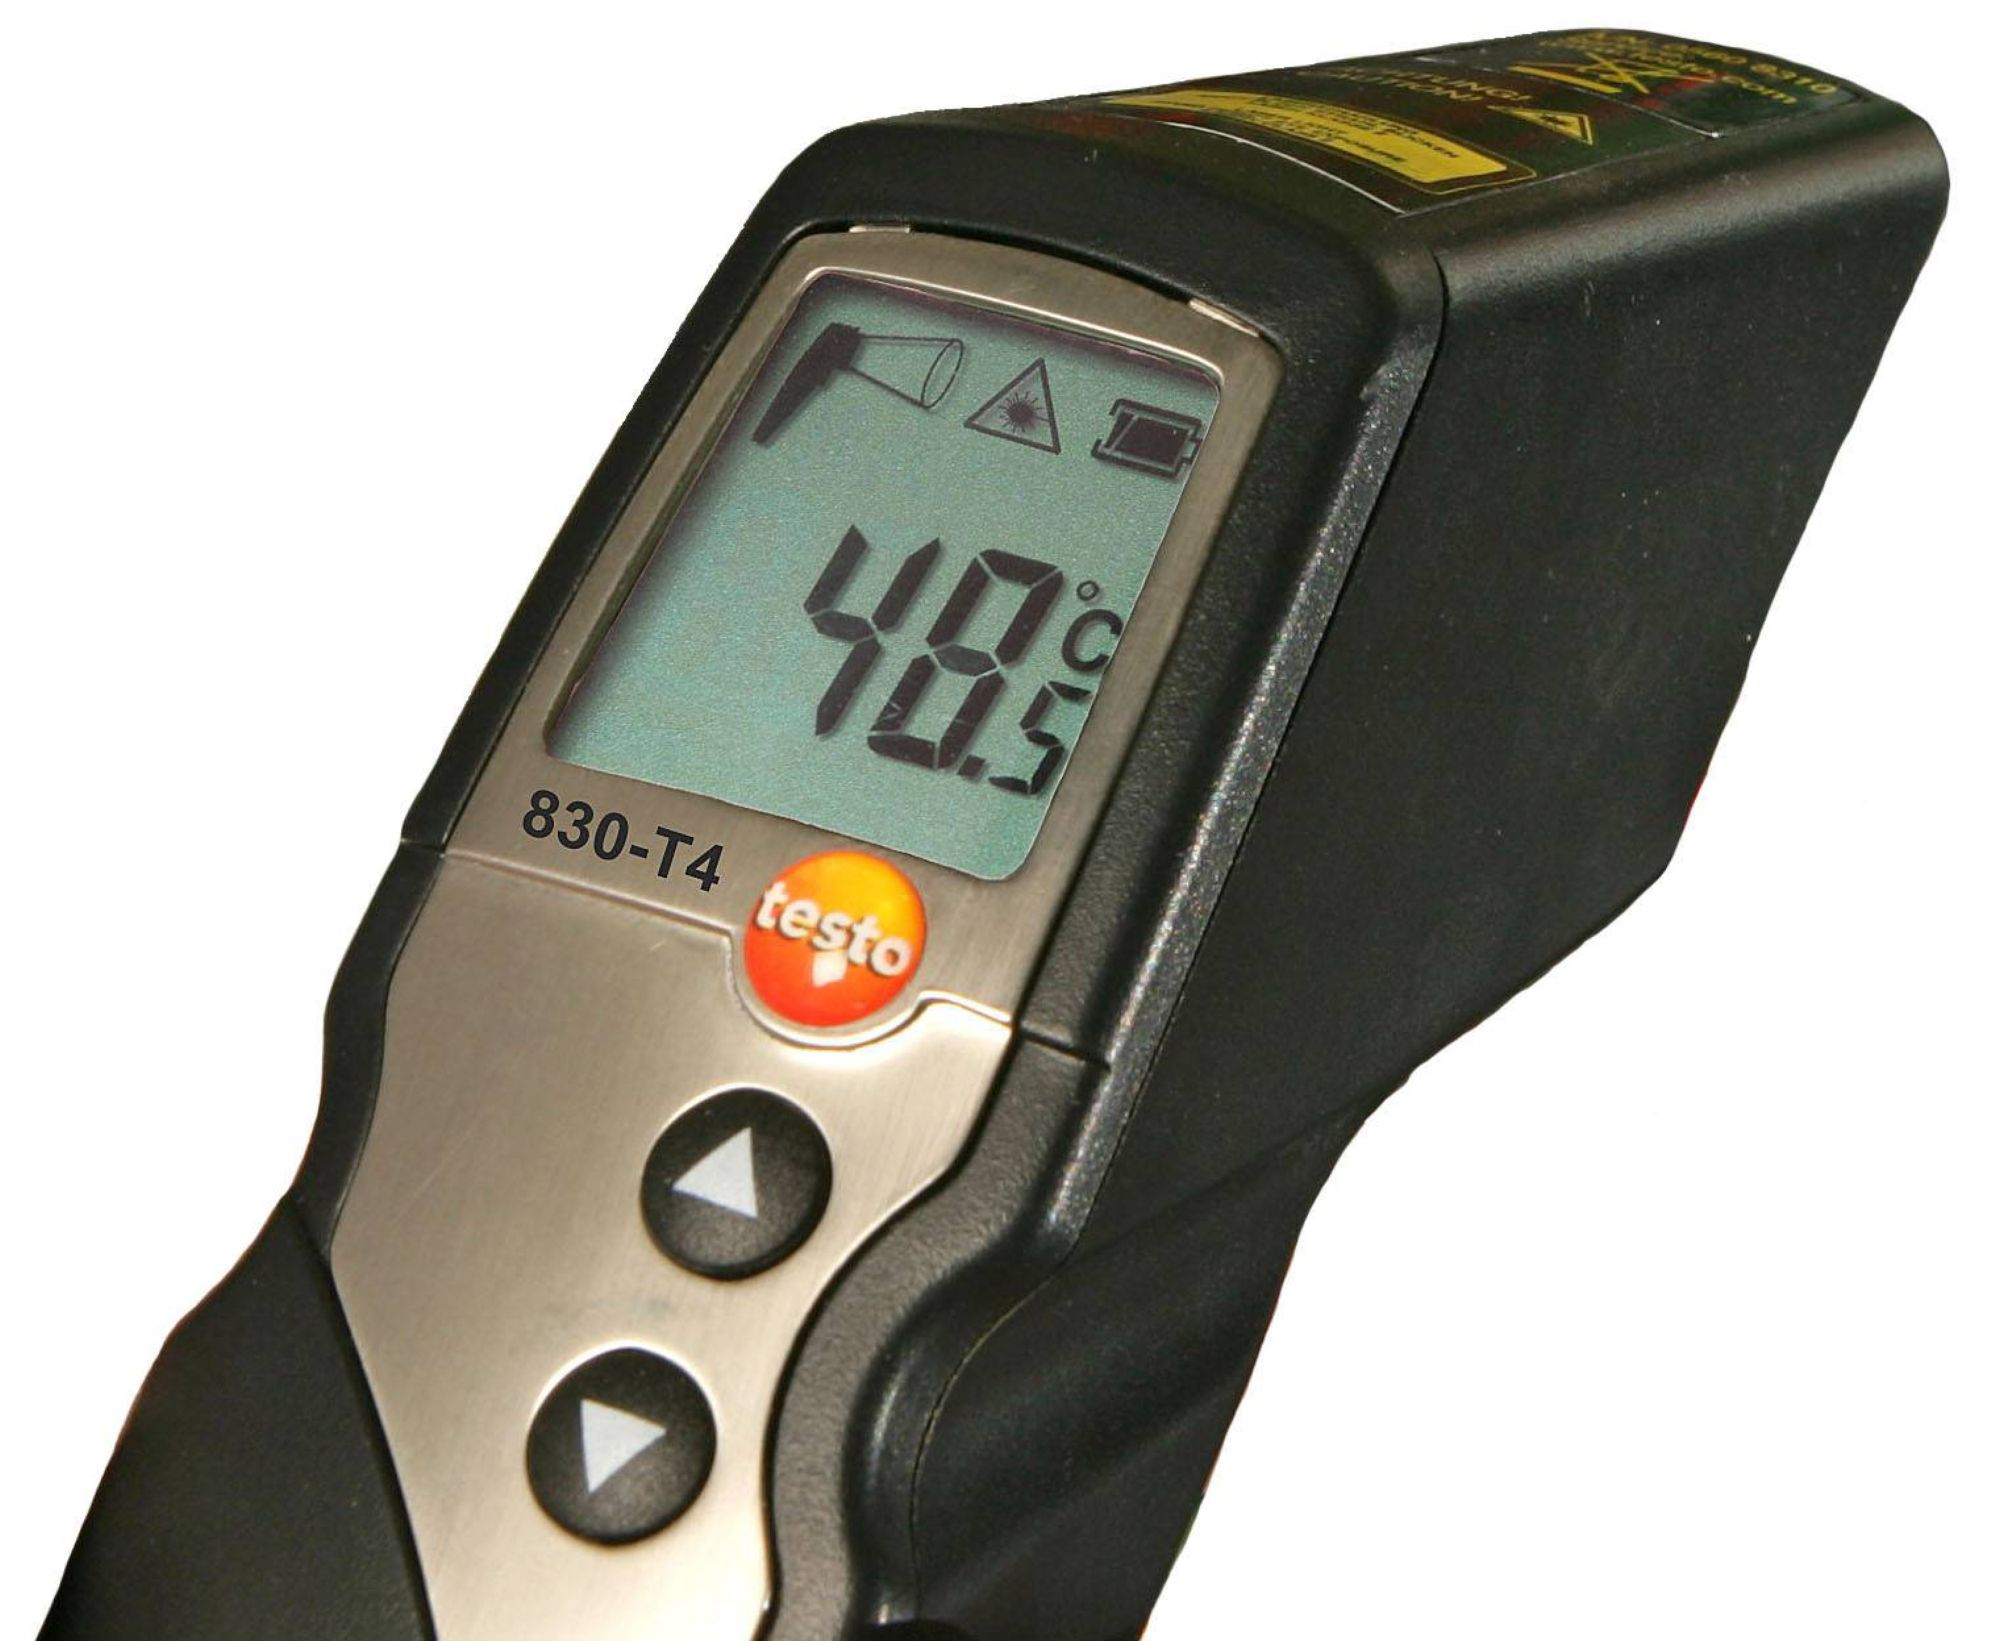 testo 830-T2